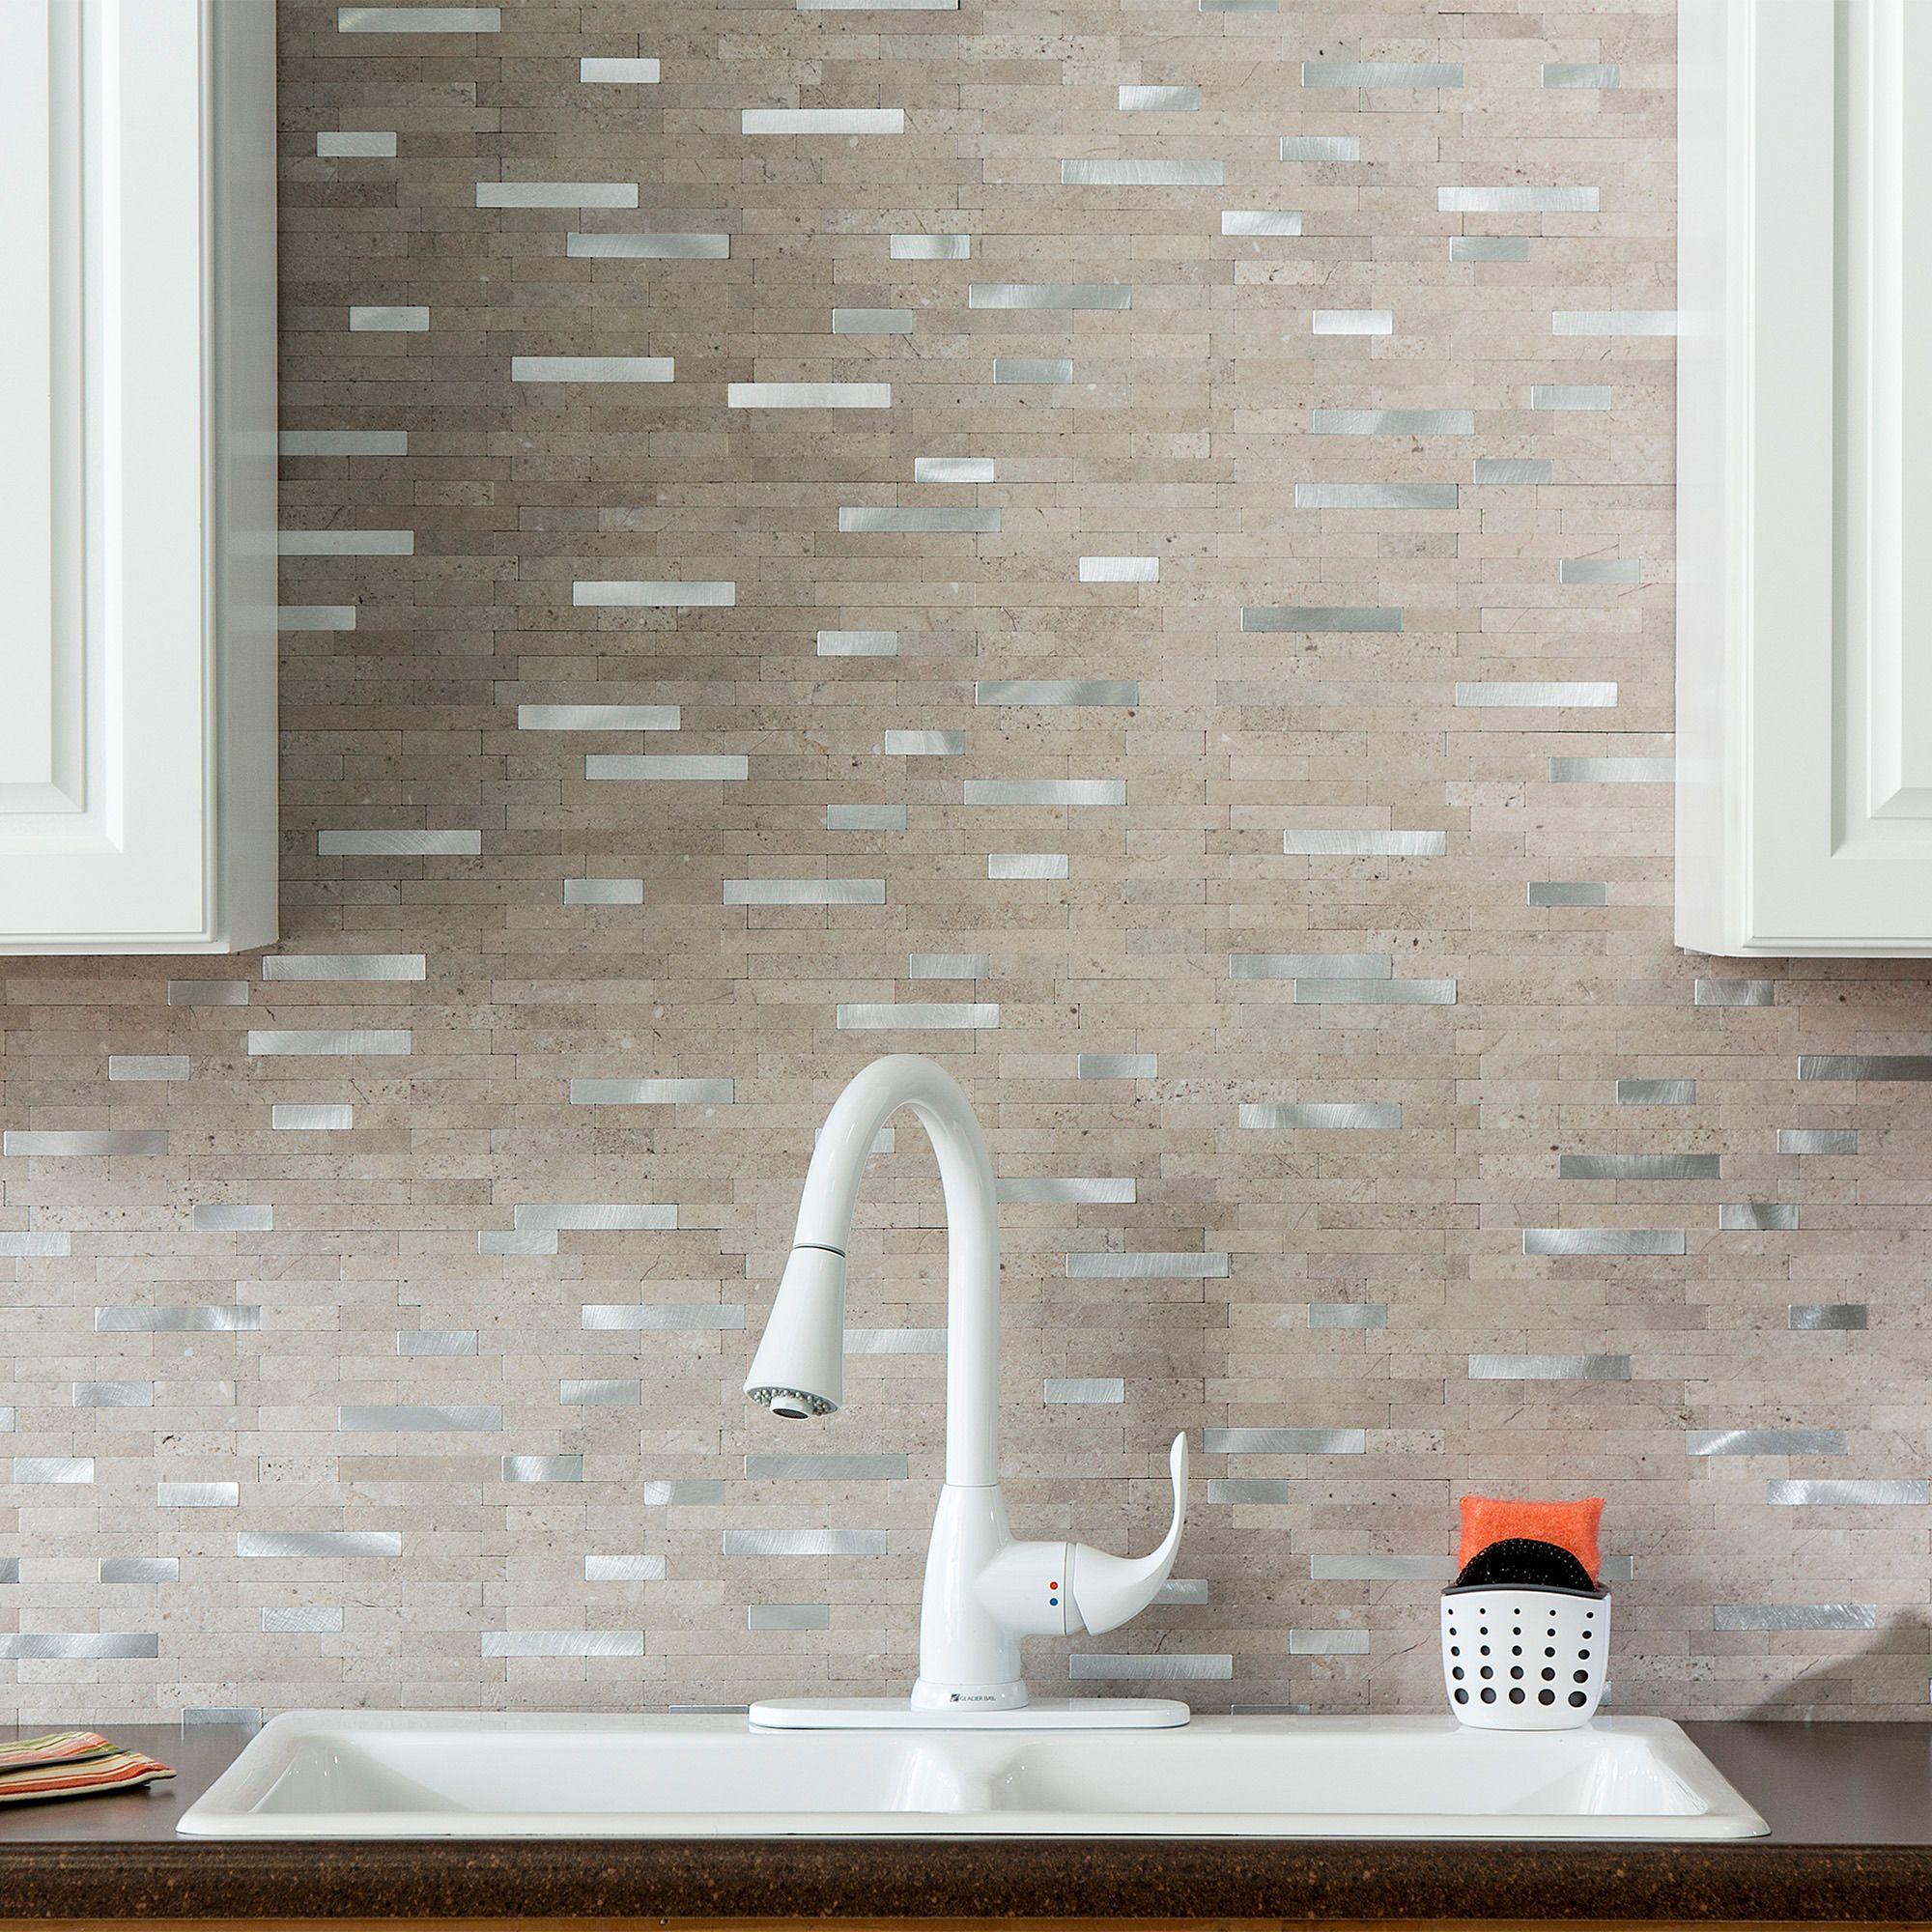 Aspect Peel And Stick Collage Tiles Diy Decor Store Stick On Tiles Peel And Stick Tile Stick Tile Backsplash